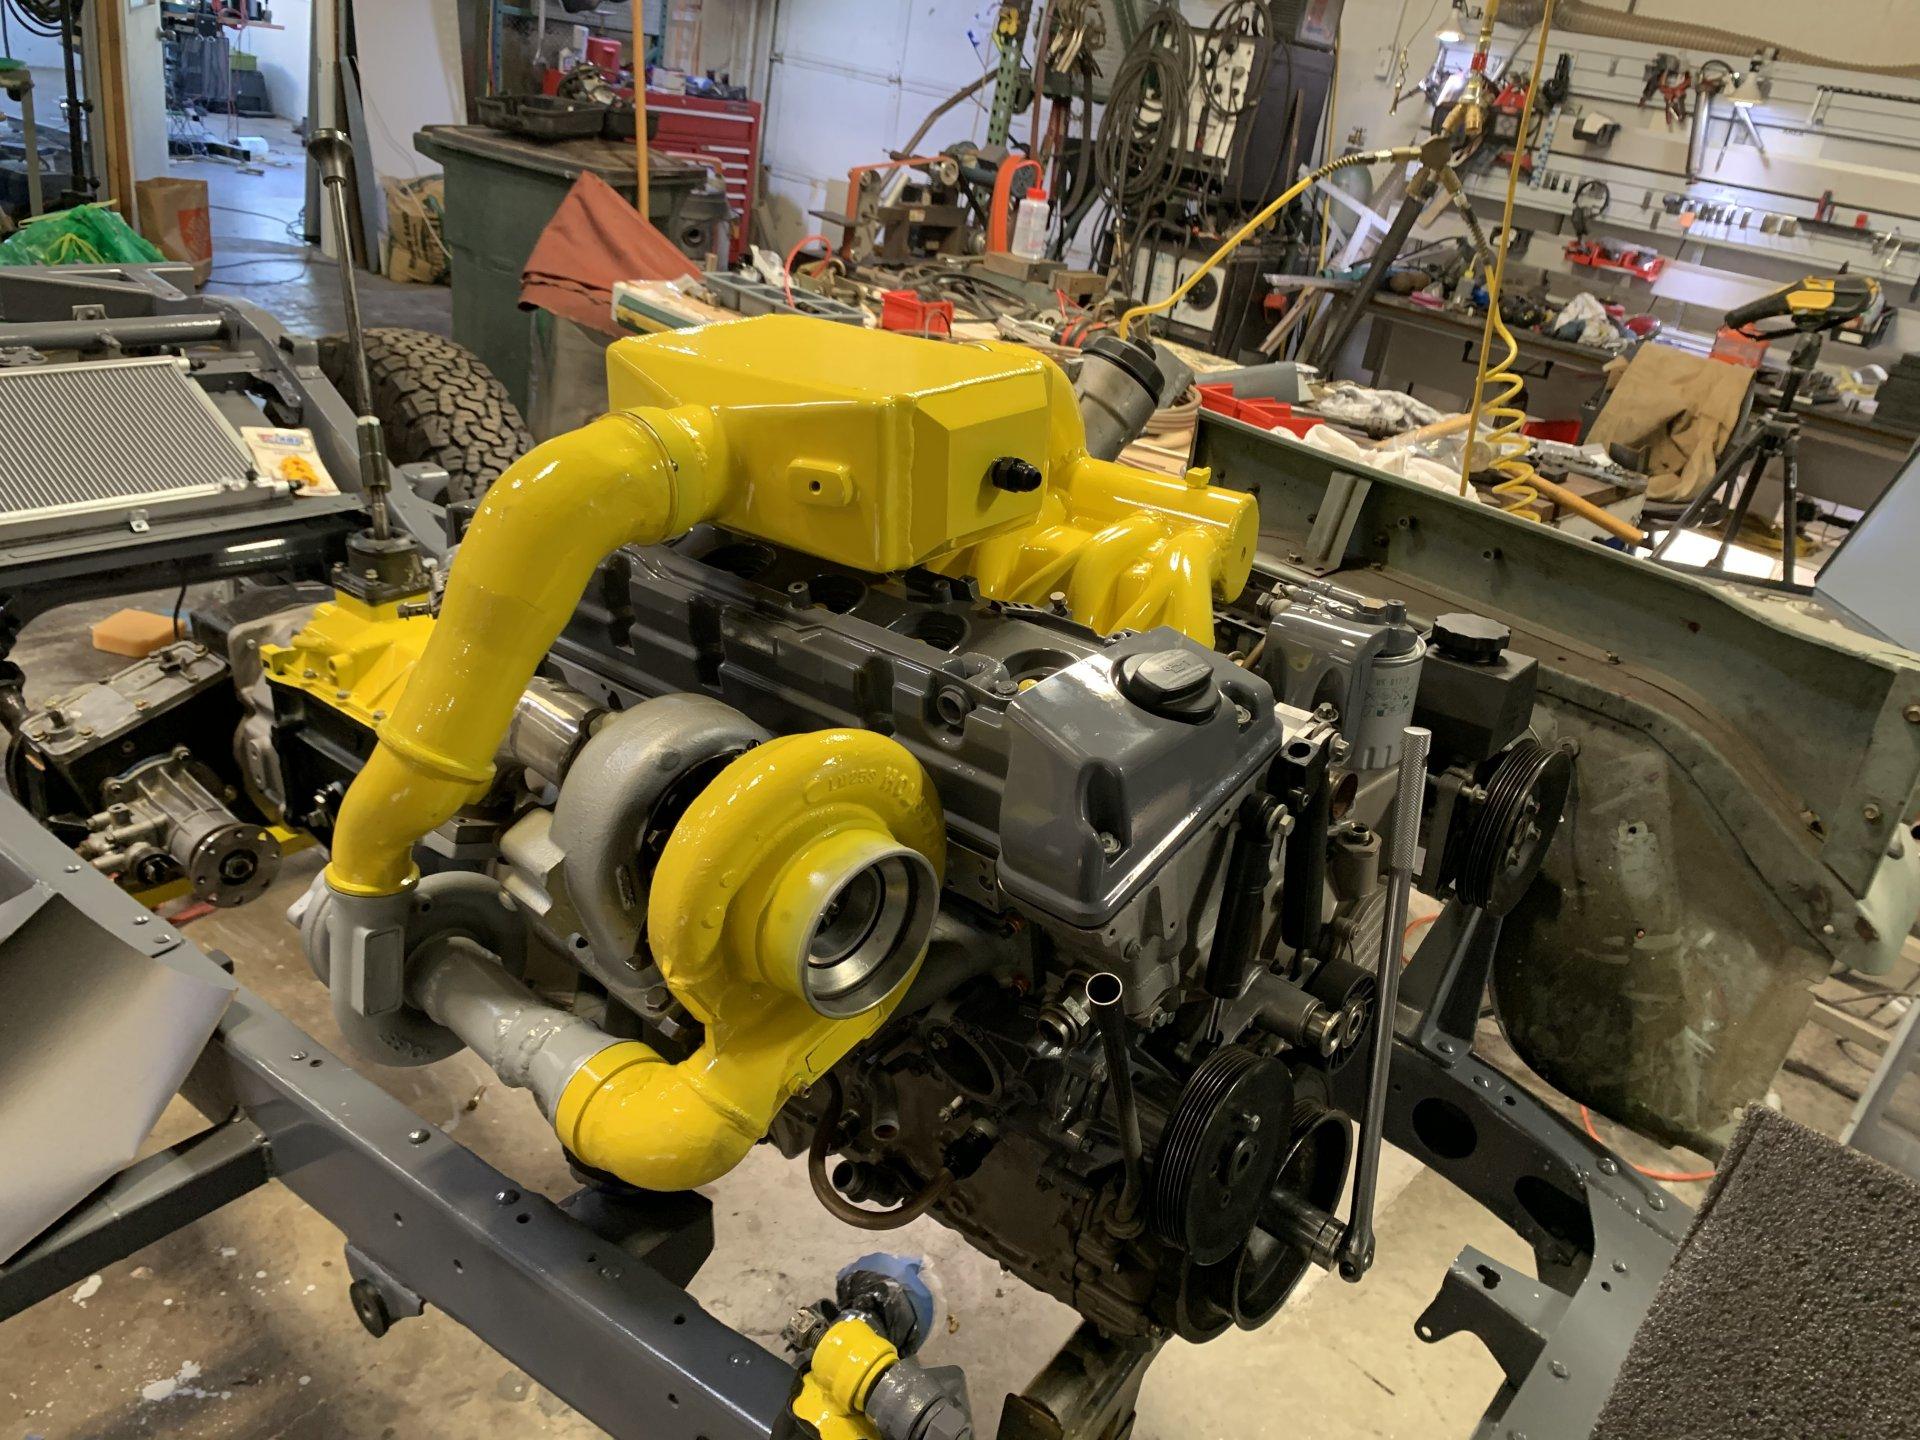 34 engine.JPG